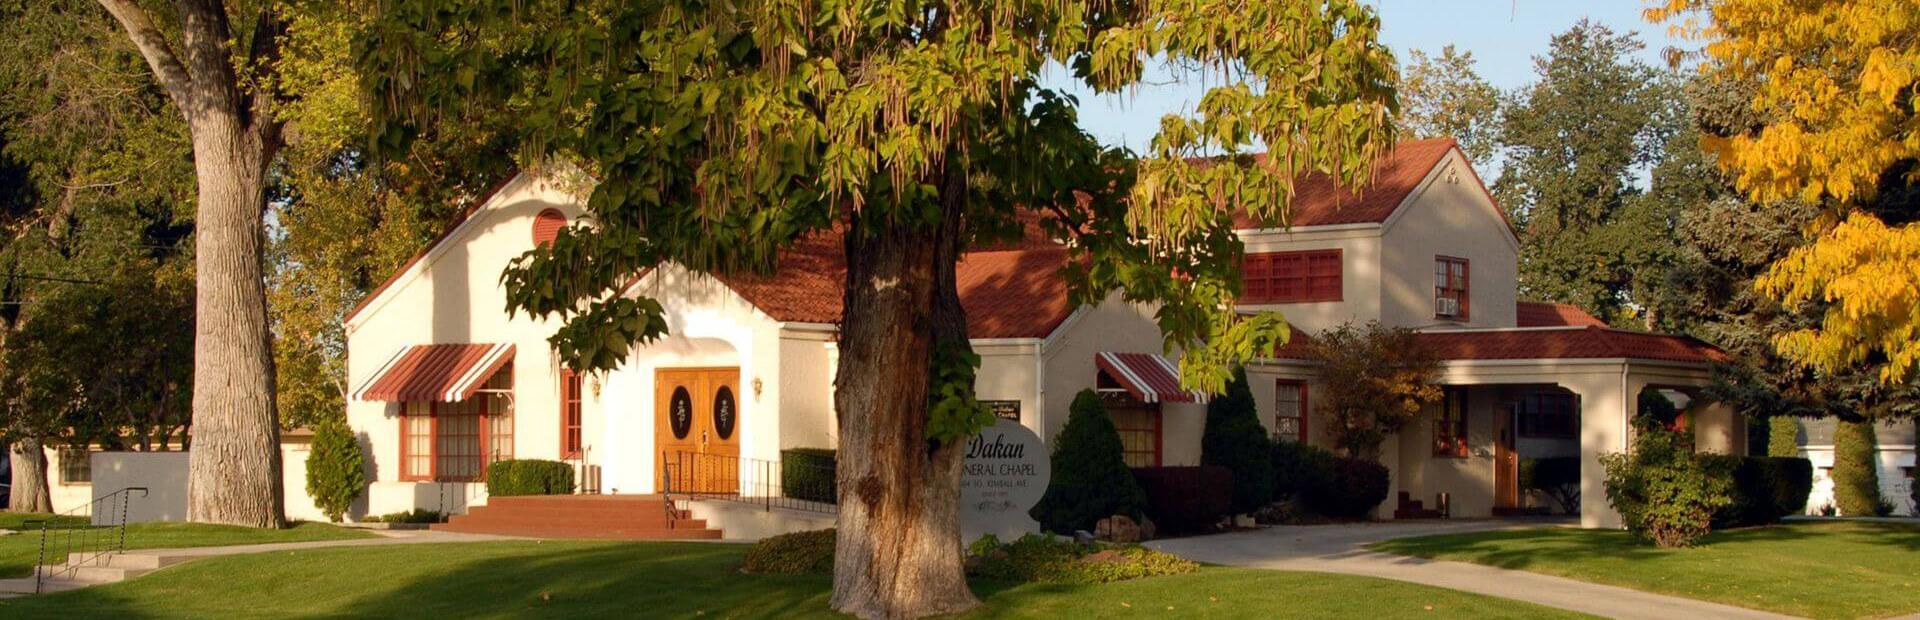 Dakan Funeral Home in Caldwell, ID